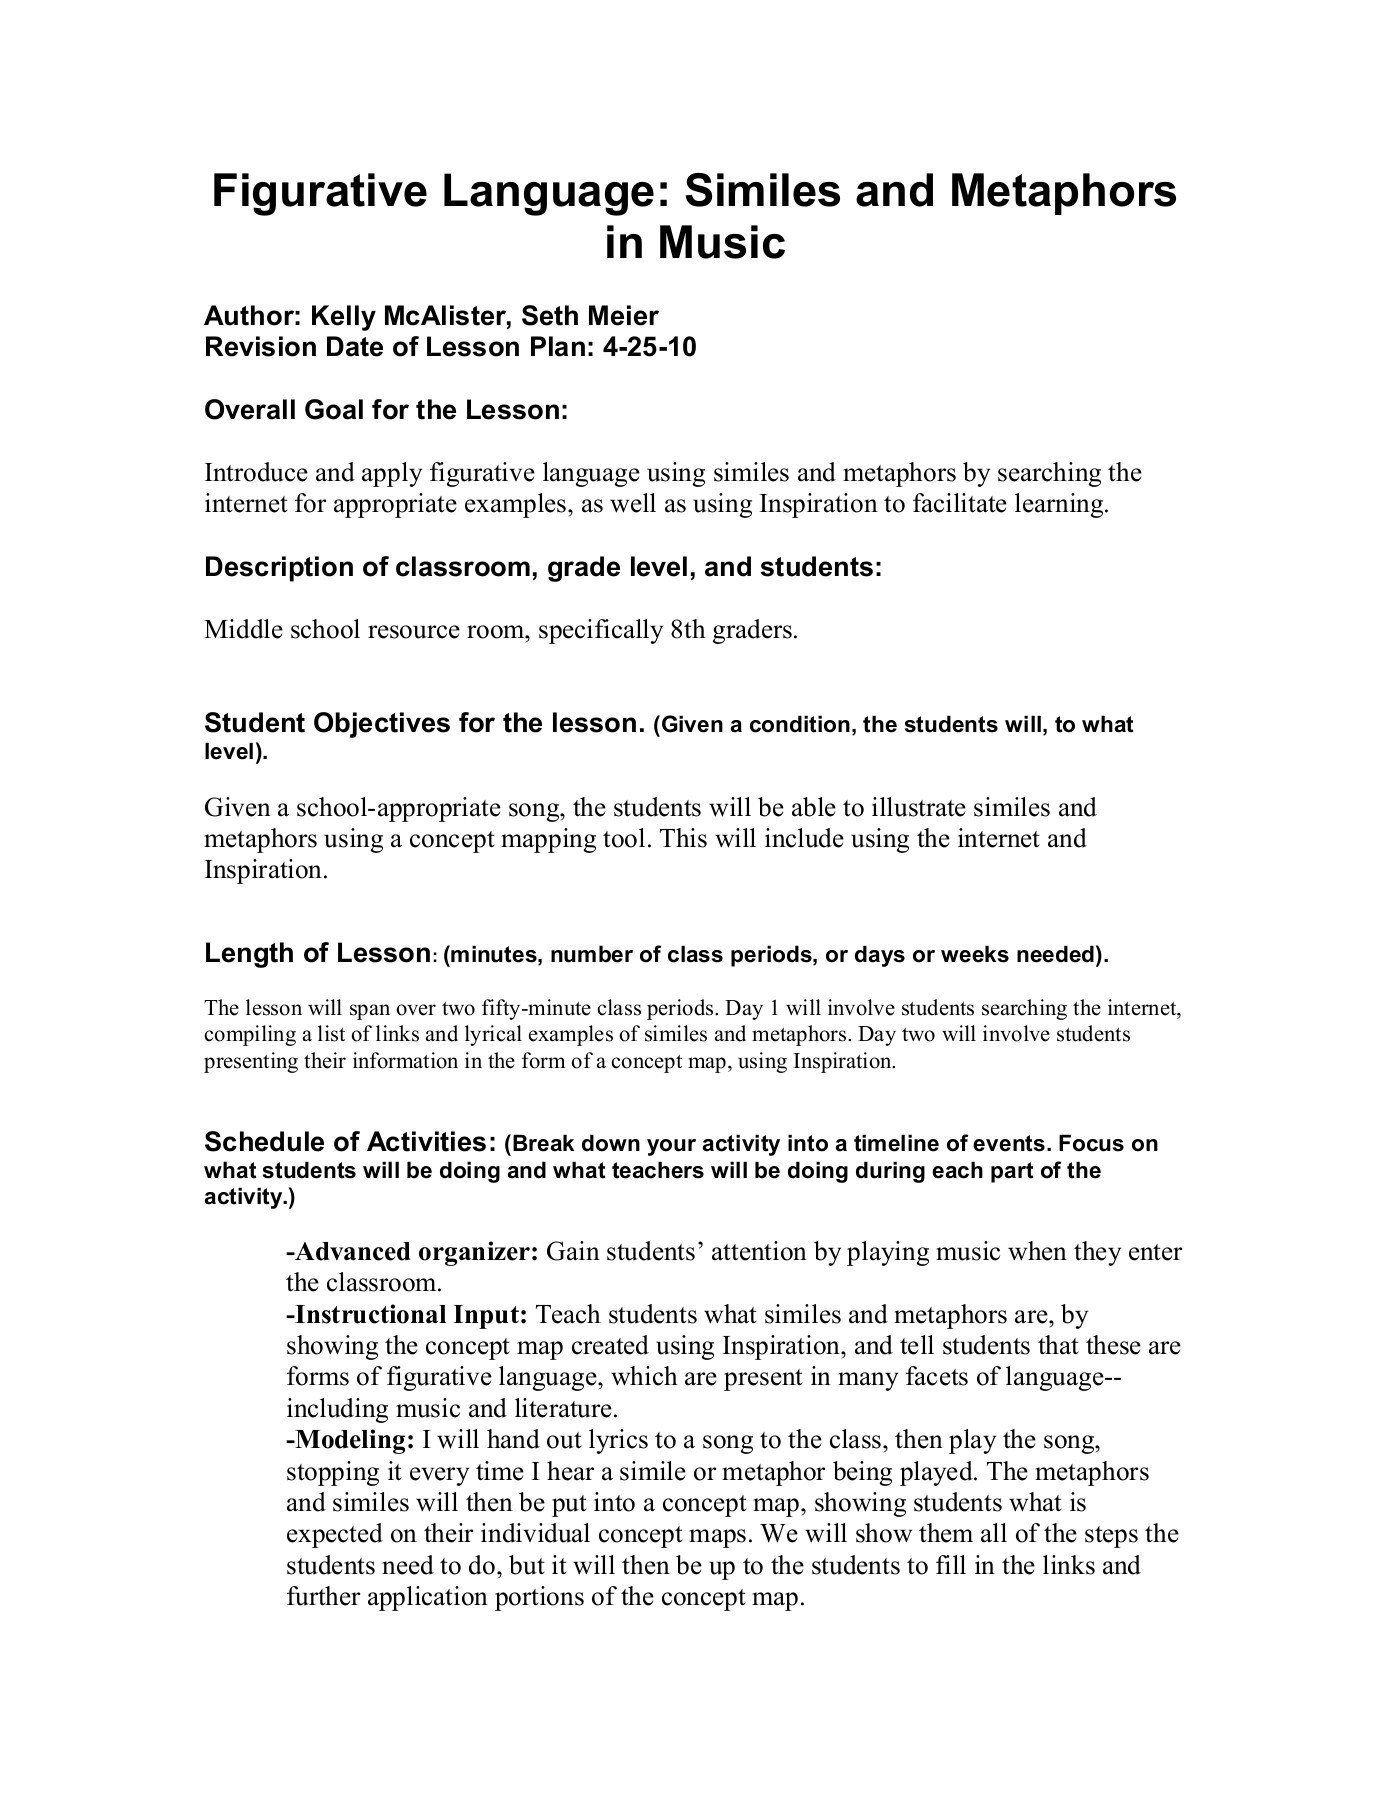 Figurative Language Worksheet Middle School Figurative Language Similes And Metaphors In Music Pa In 2020 Similes And Metaphors Funny Dating Quotes Figurative Language